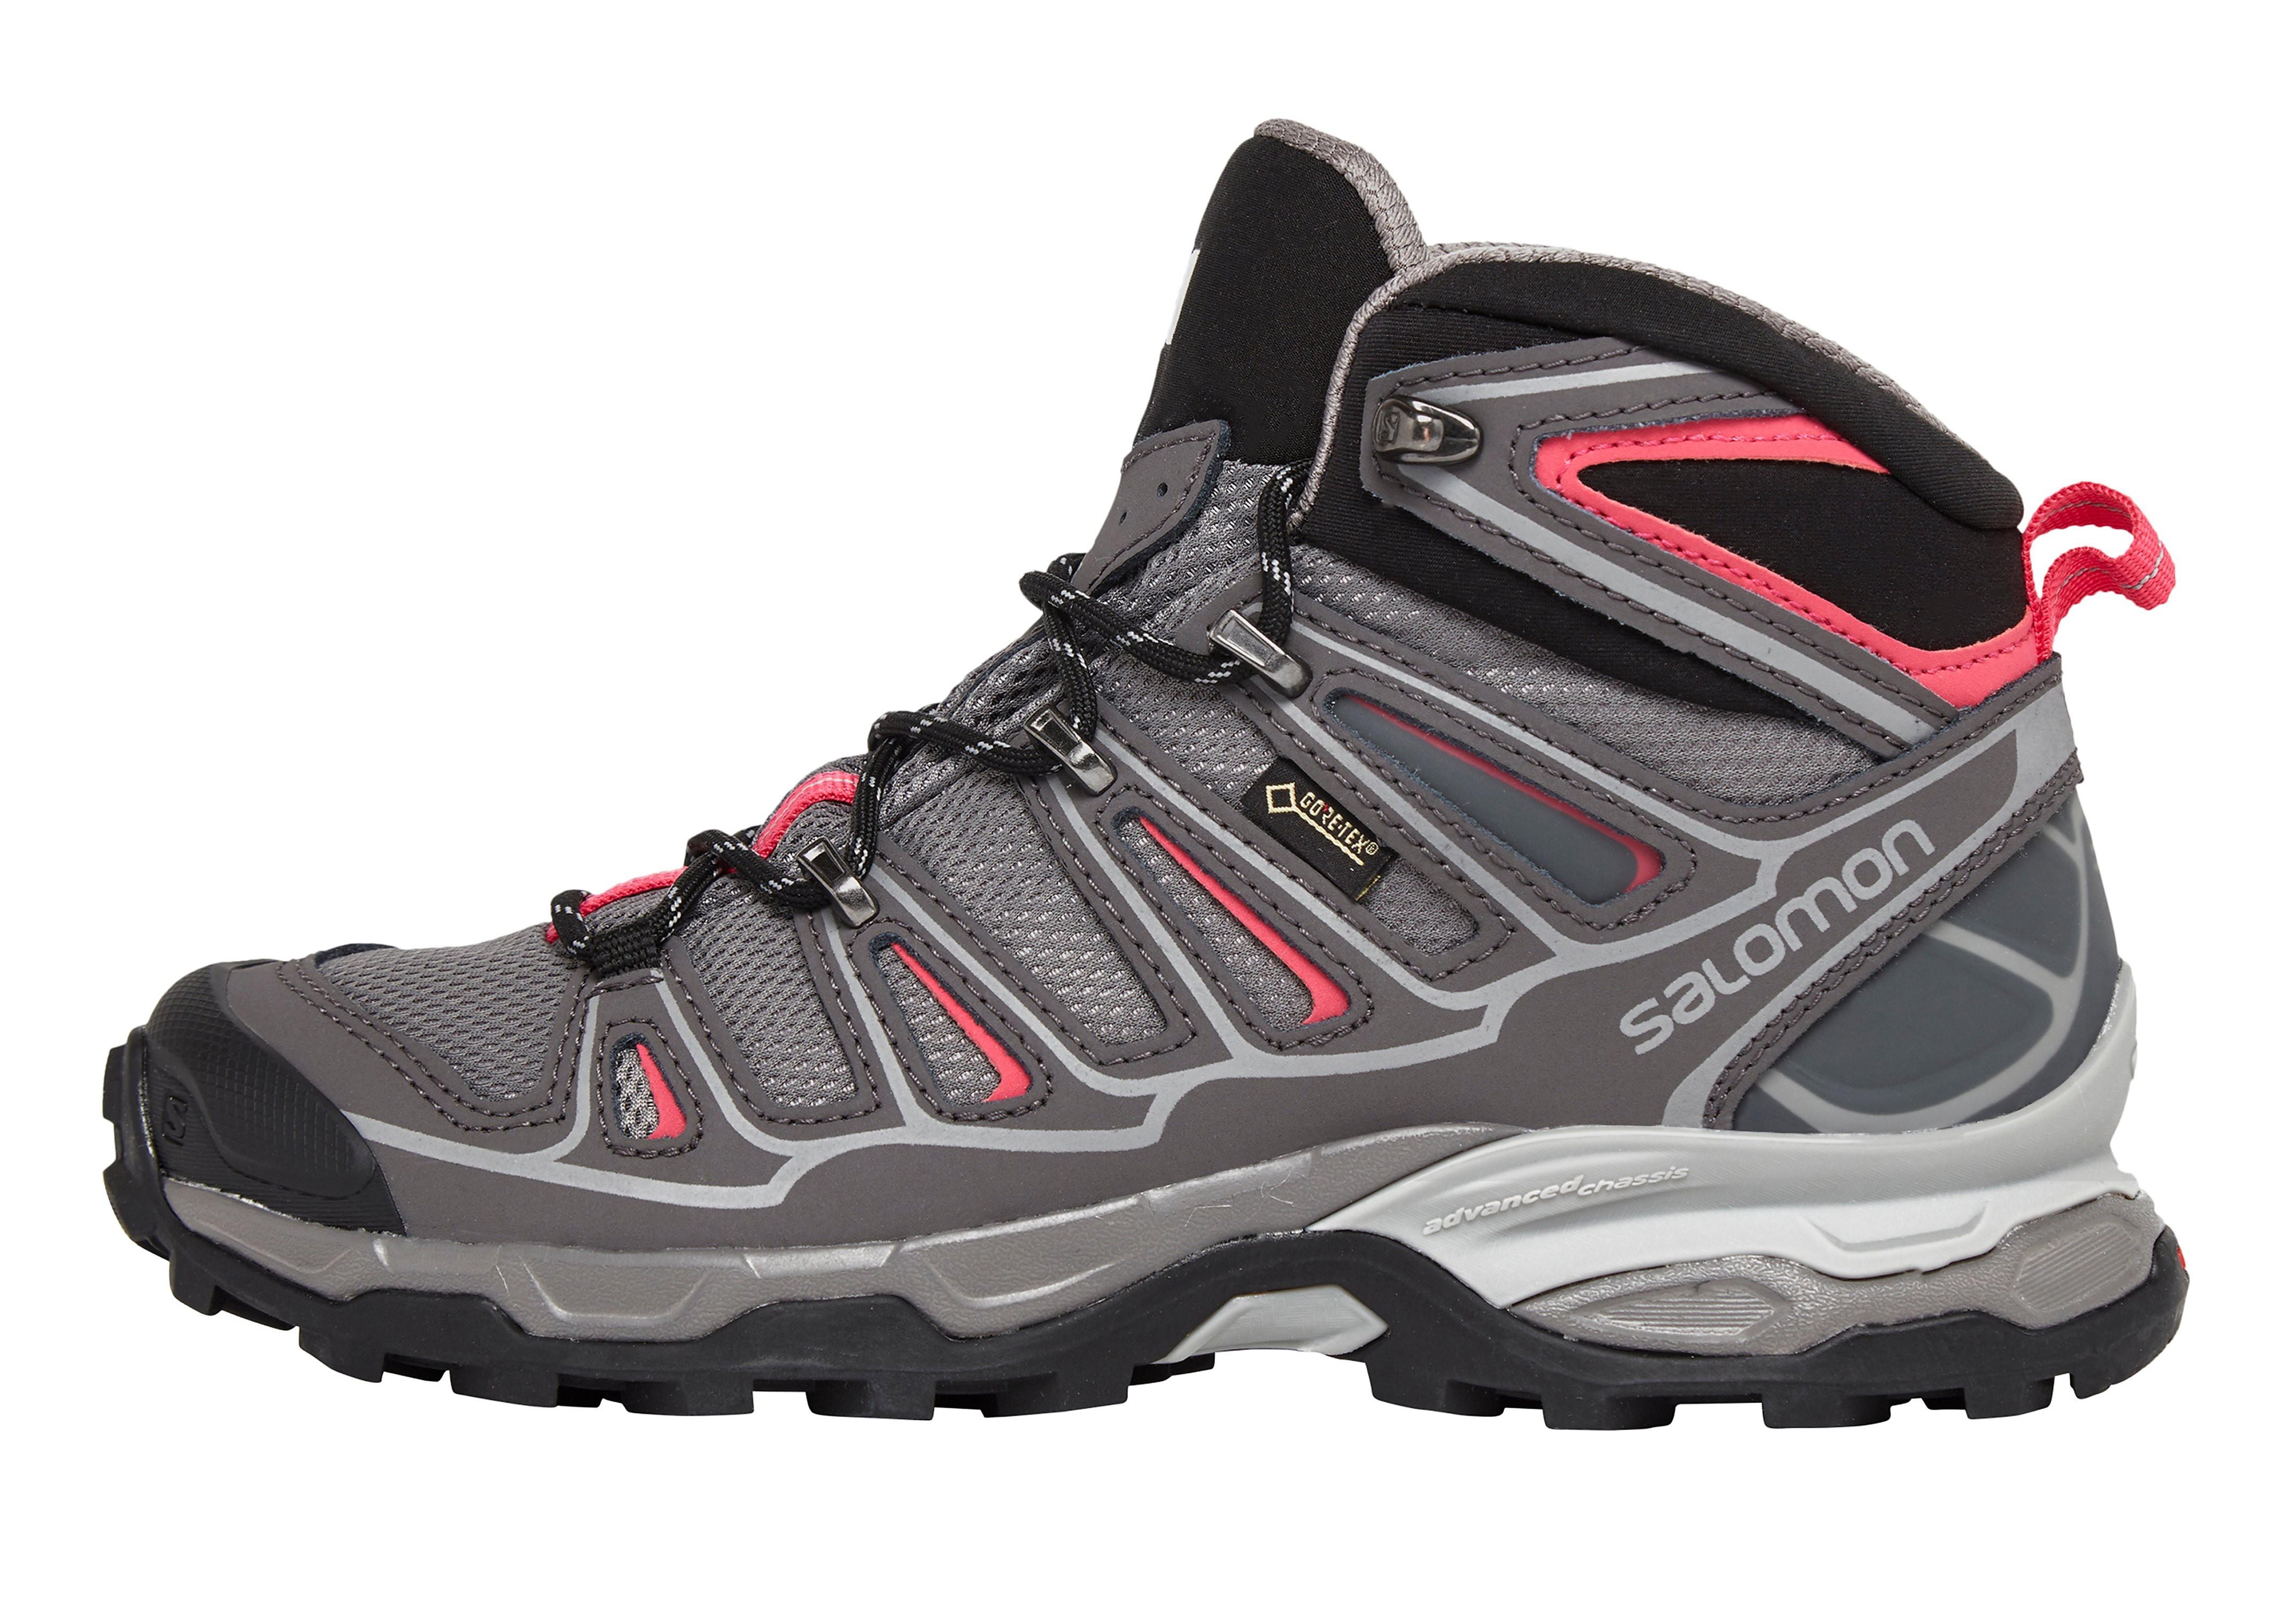 Salomon X Ultra Mid GTX Waking Boots